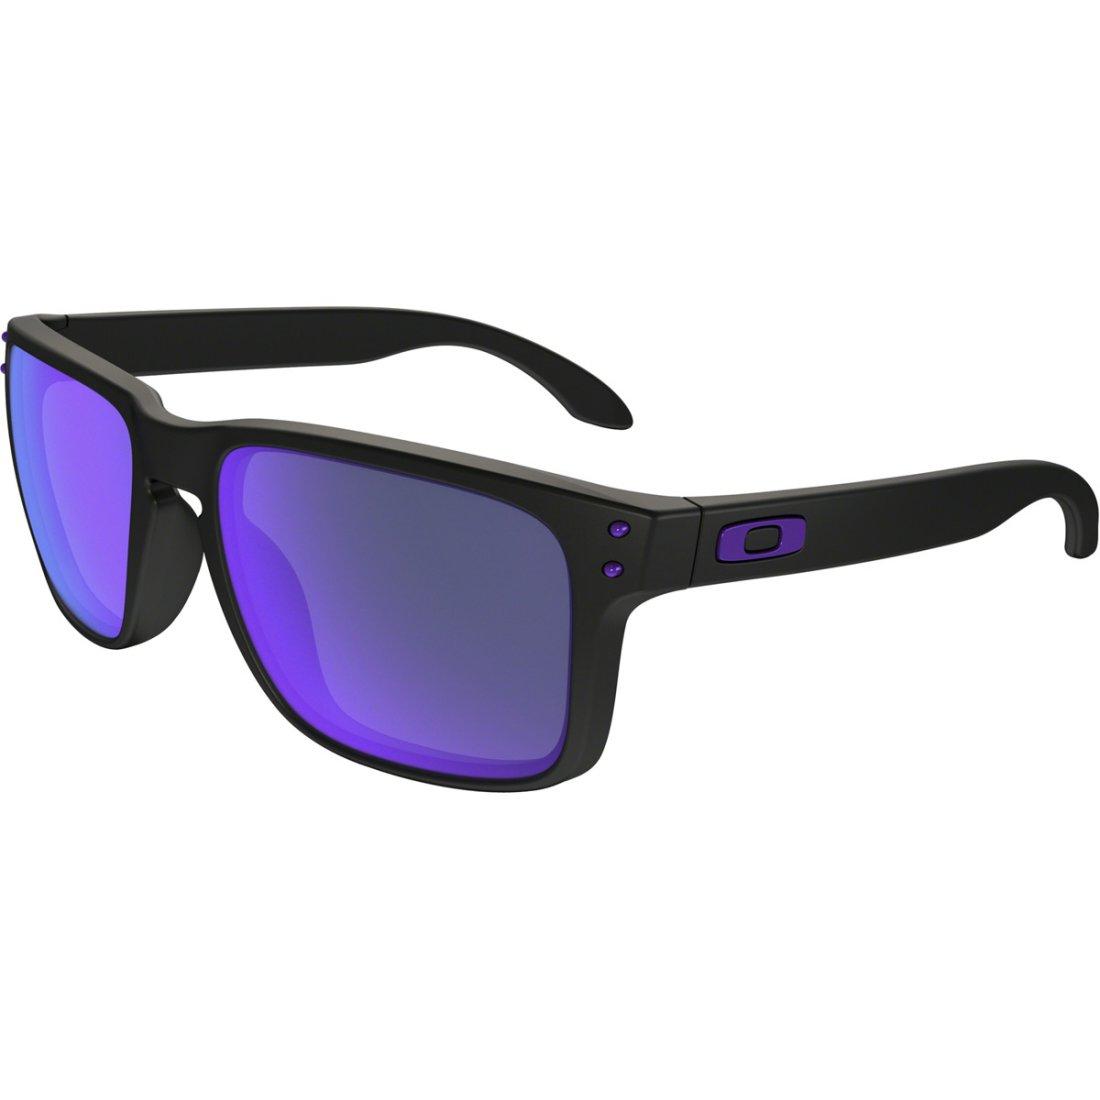 bf52adacc09 OAKLEY Holbrook Julian Wilson Signature Series Matte Black   Violet Iridium  Mask   Goggle · Motocard